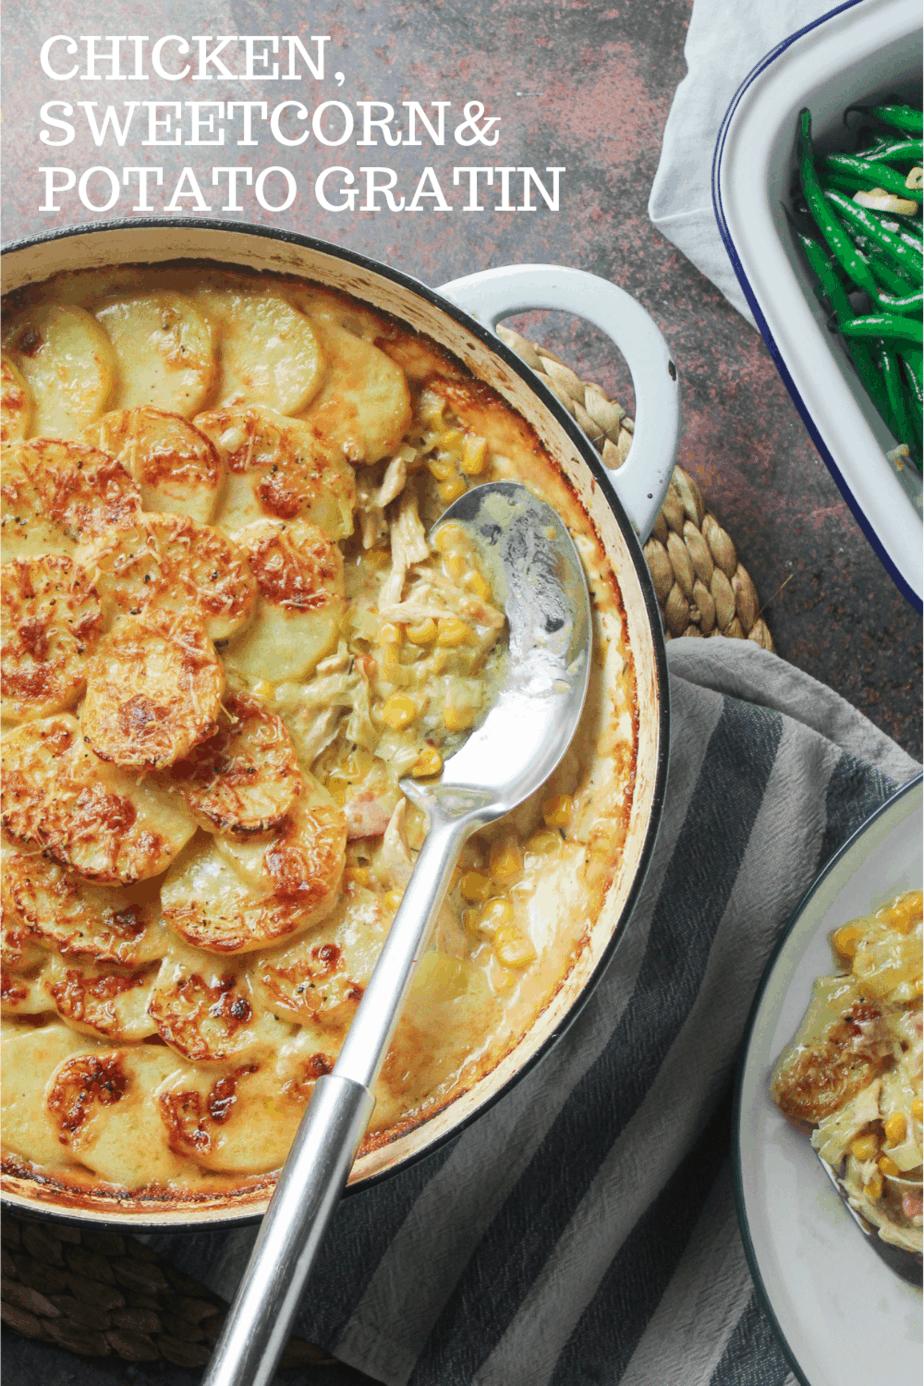 Chicken, Sweetcorn & Potato Gratin